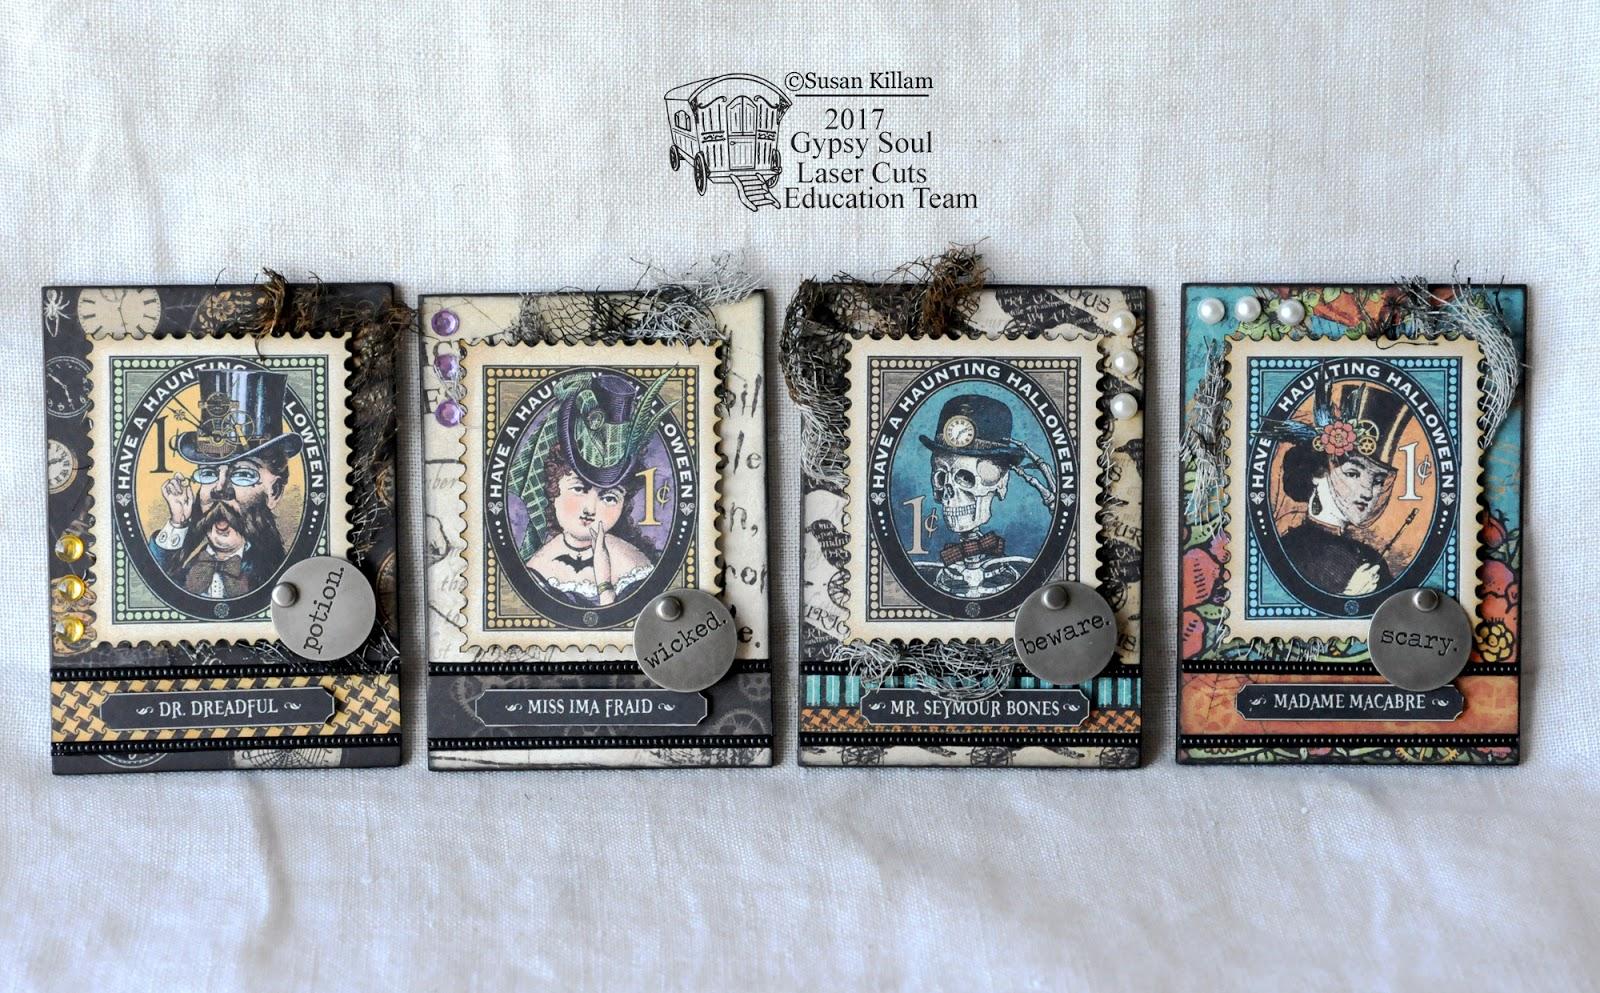 Gypsy Soul Laser Cuts Steampunk Halloween Art Card Set By Susan